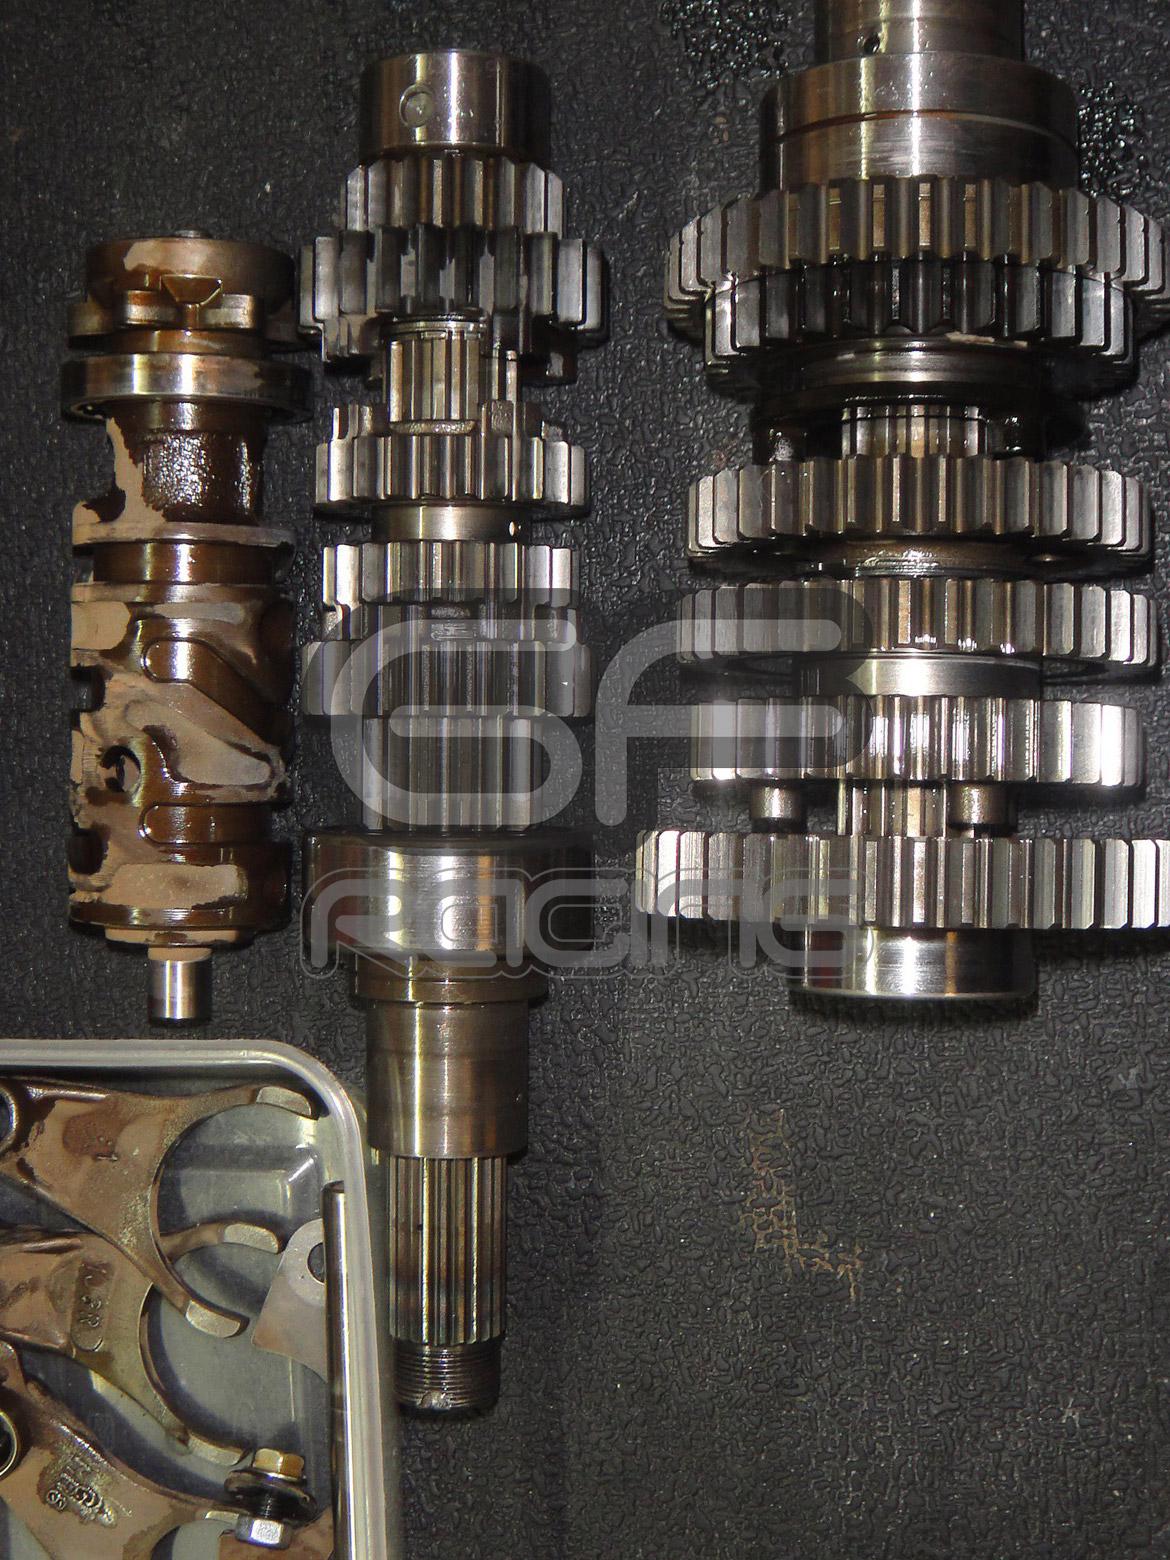 Honda VFR400 NC30 Good Used Gearbox